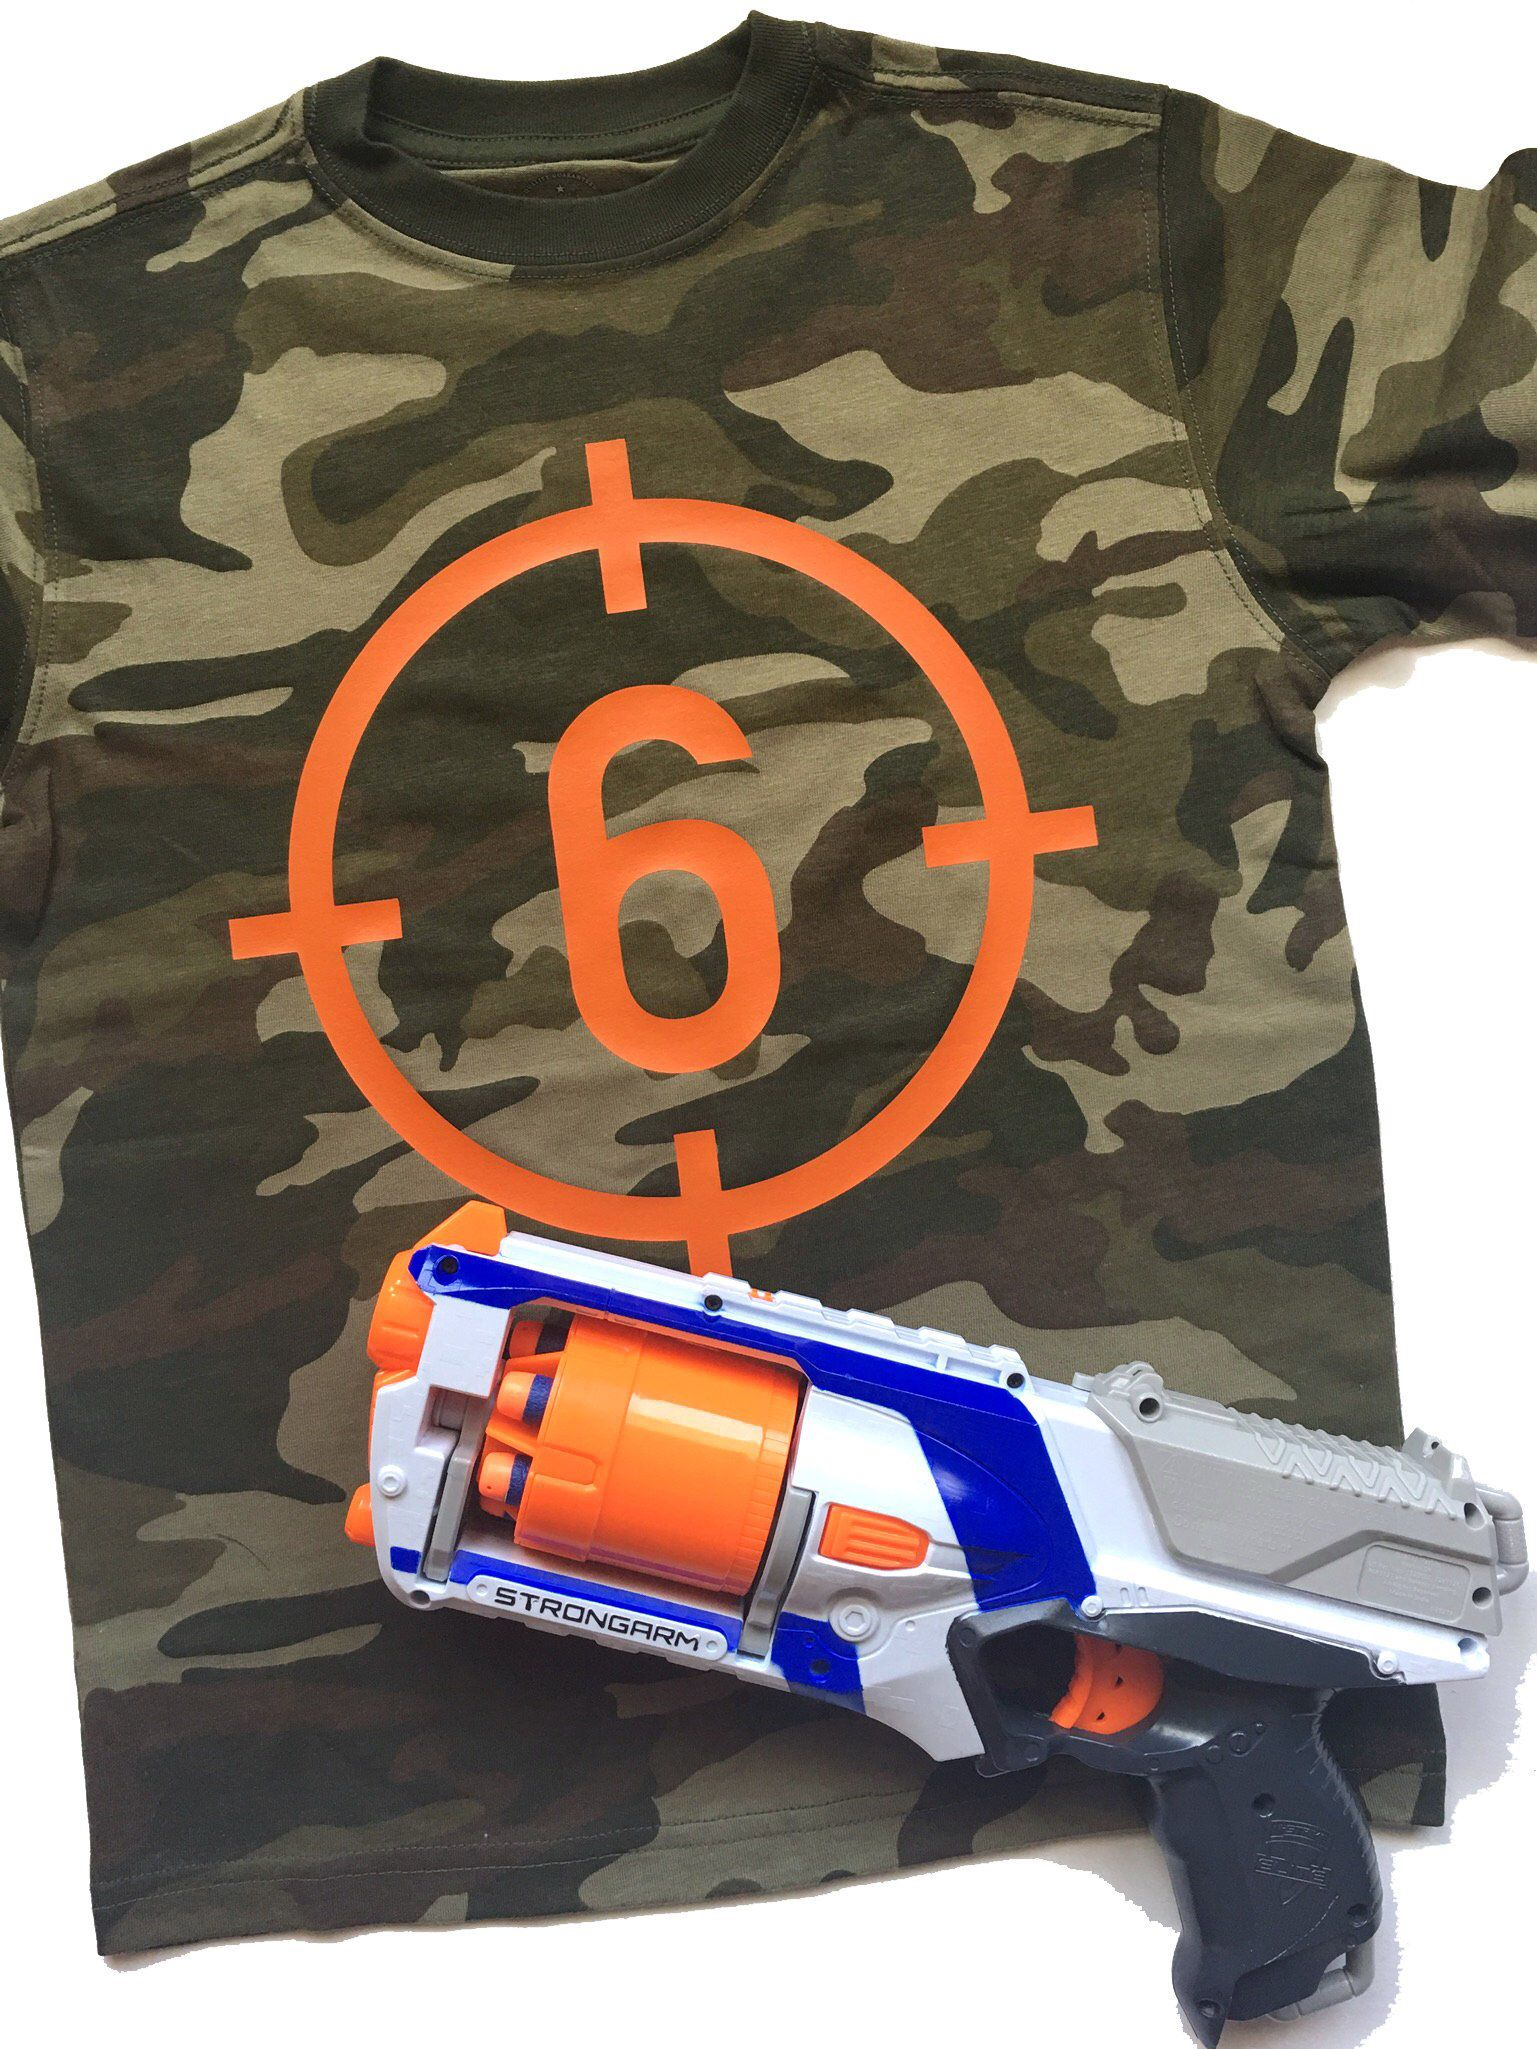 3ac6471303 Shooting Birthday Shirt - Target Shirt - Bullseye Birthday Shirt - Party  Shirt - Kids Shirt